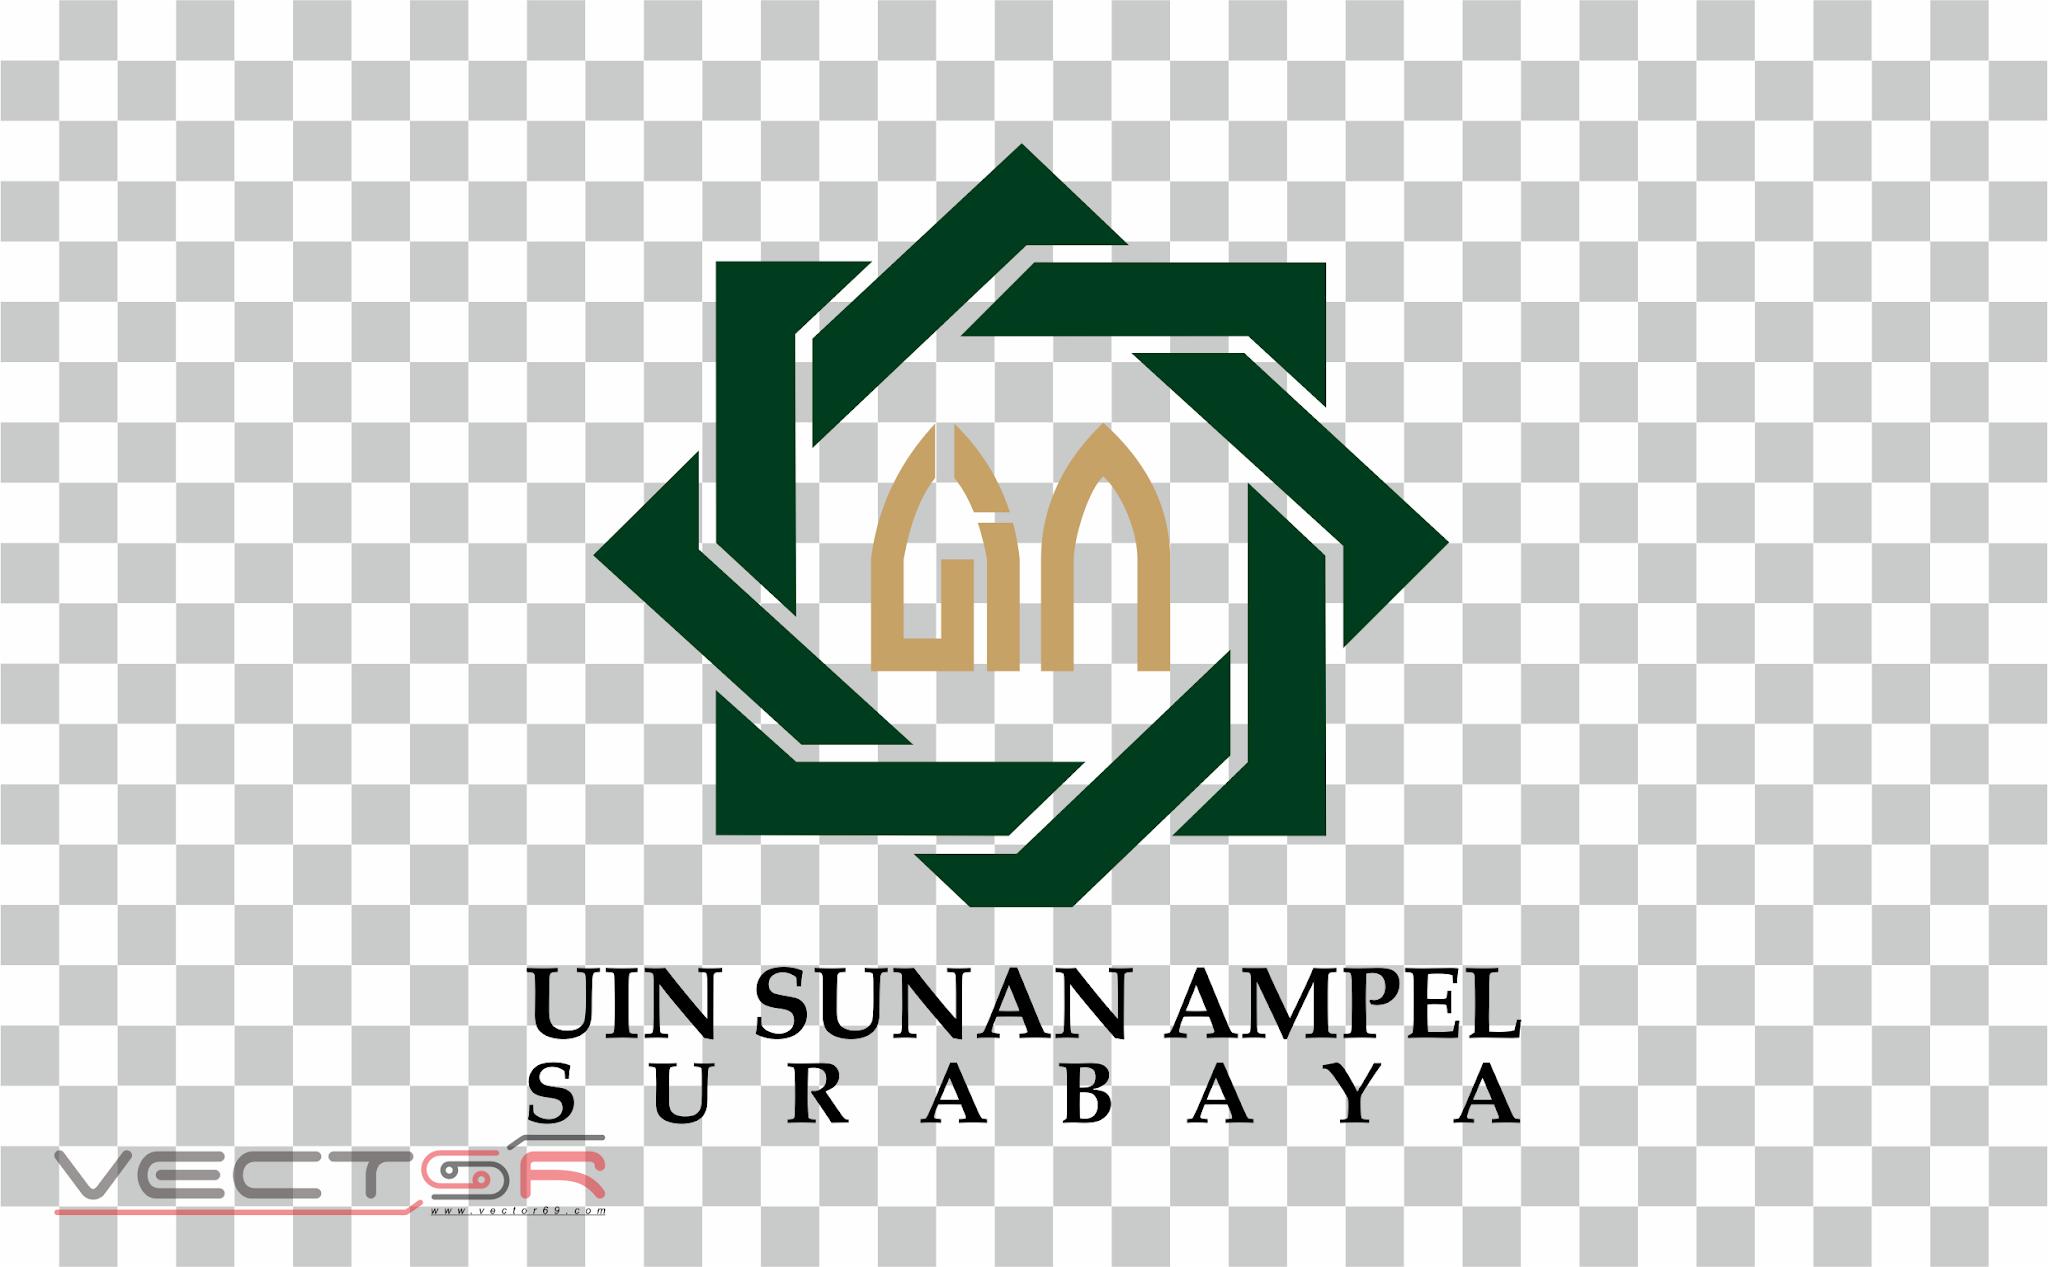 Universitas Islam Negeri Sunan Ampel (UINSA) Surabaya Logo - Download Vector File PNG (Portable Network Graphics)